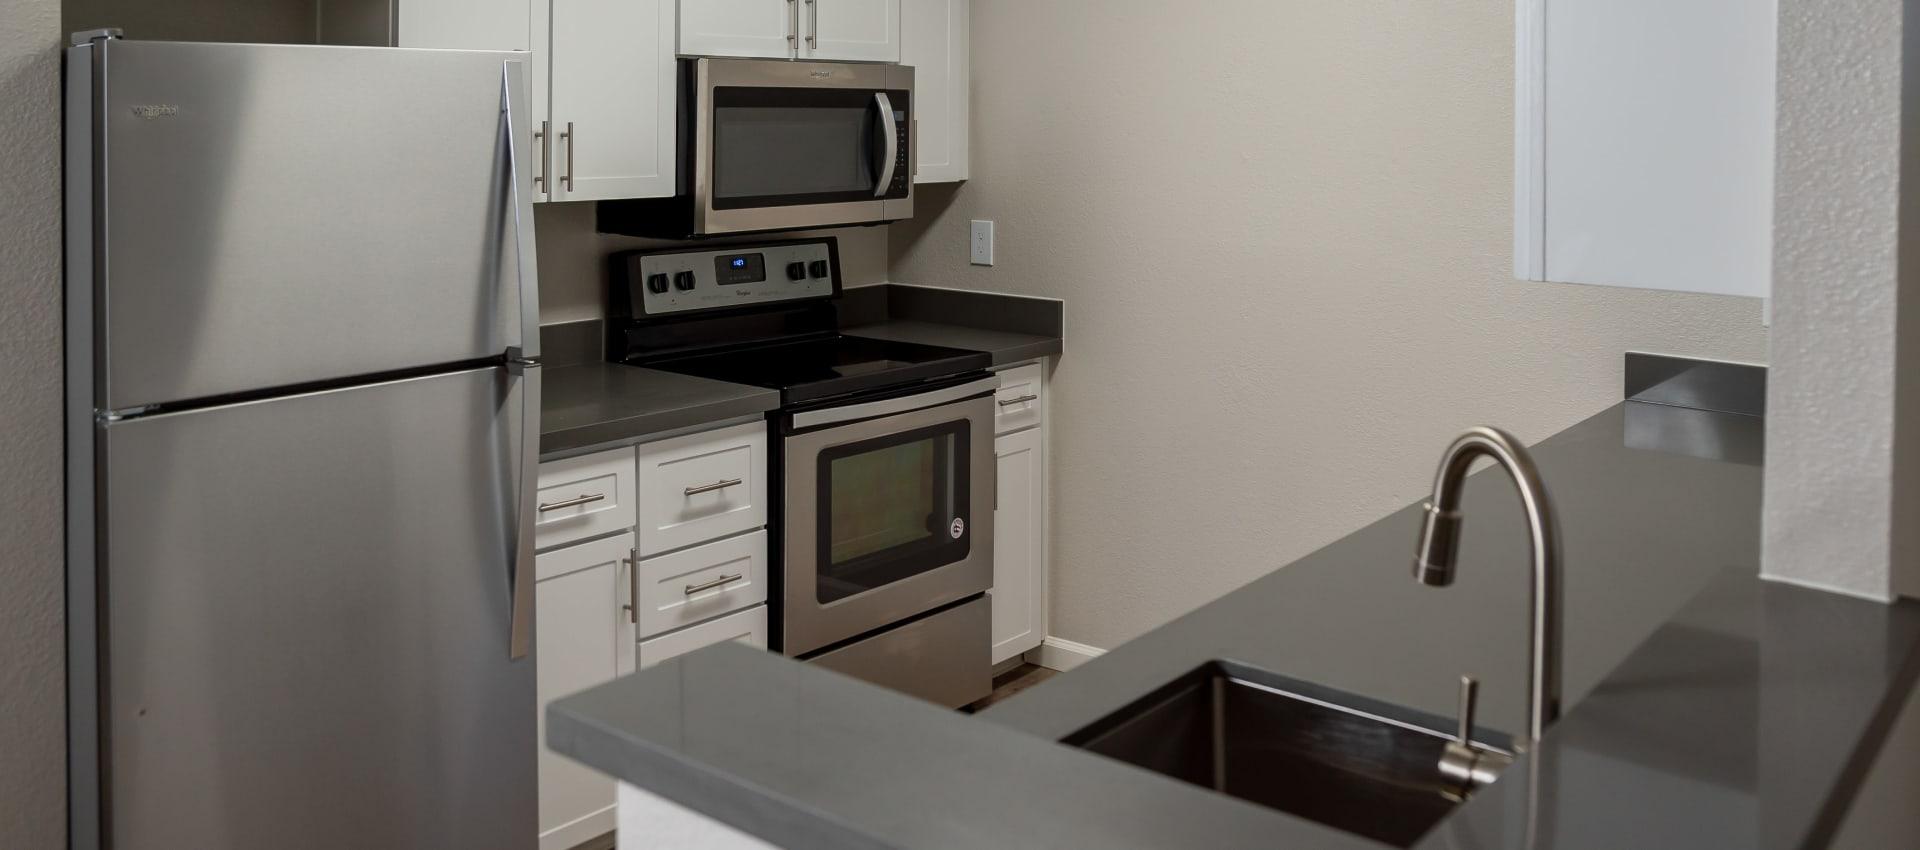 Kitchen at Shaliko in Rocklin, CA